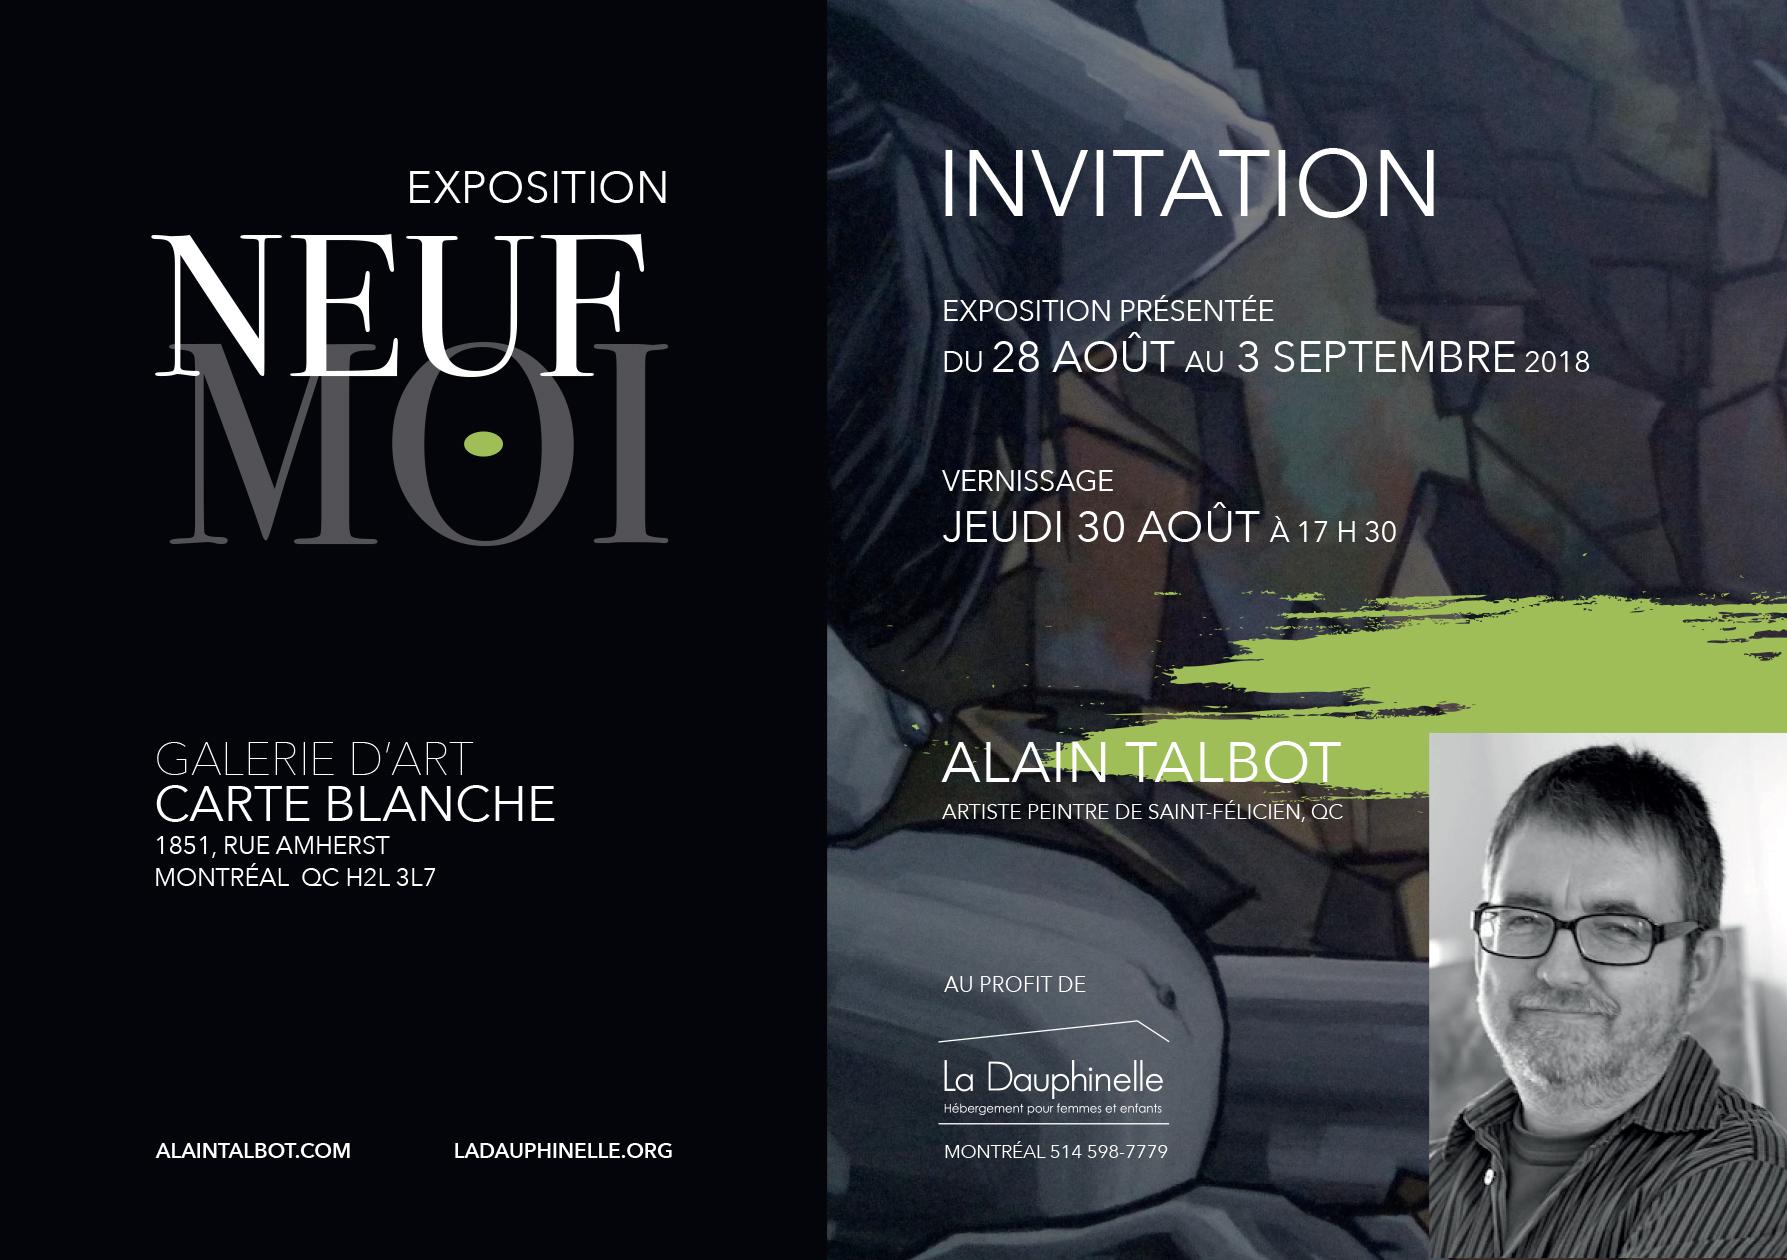 Invitation Expo Alain Talbot 2018.jpg